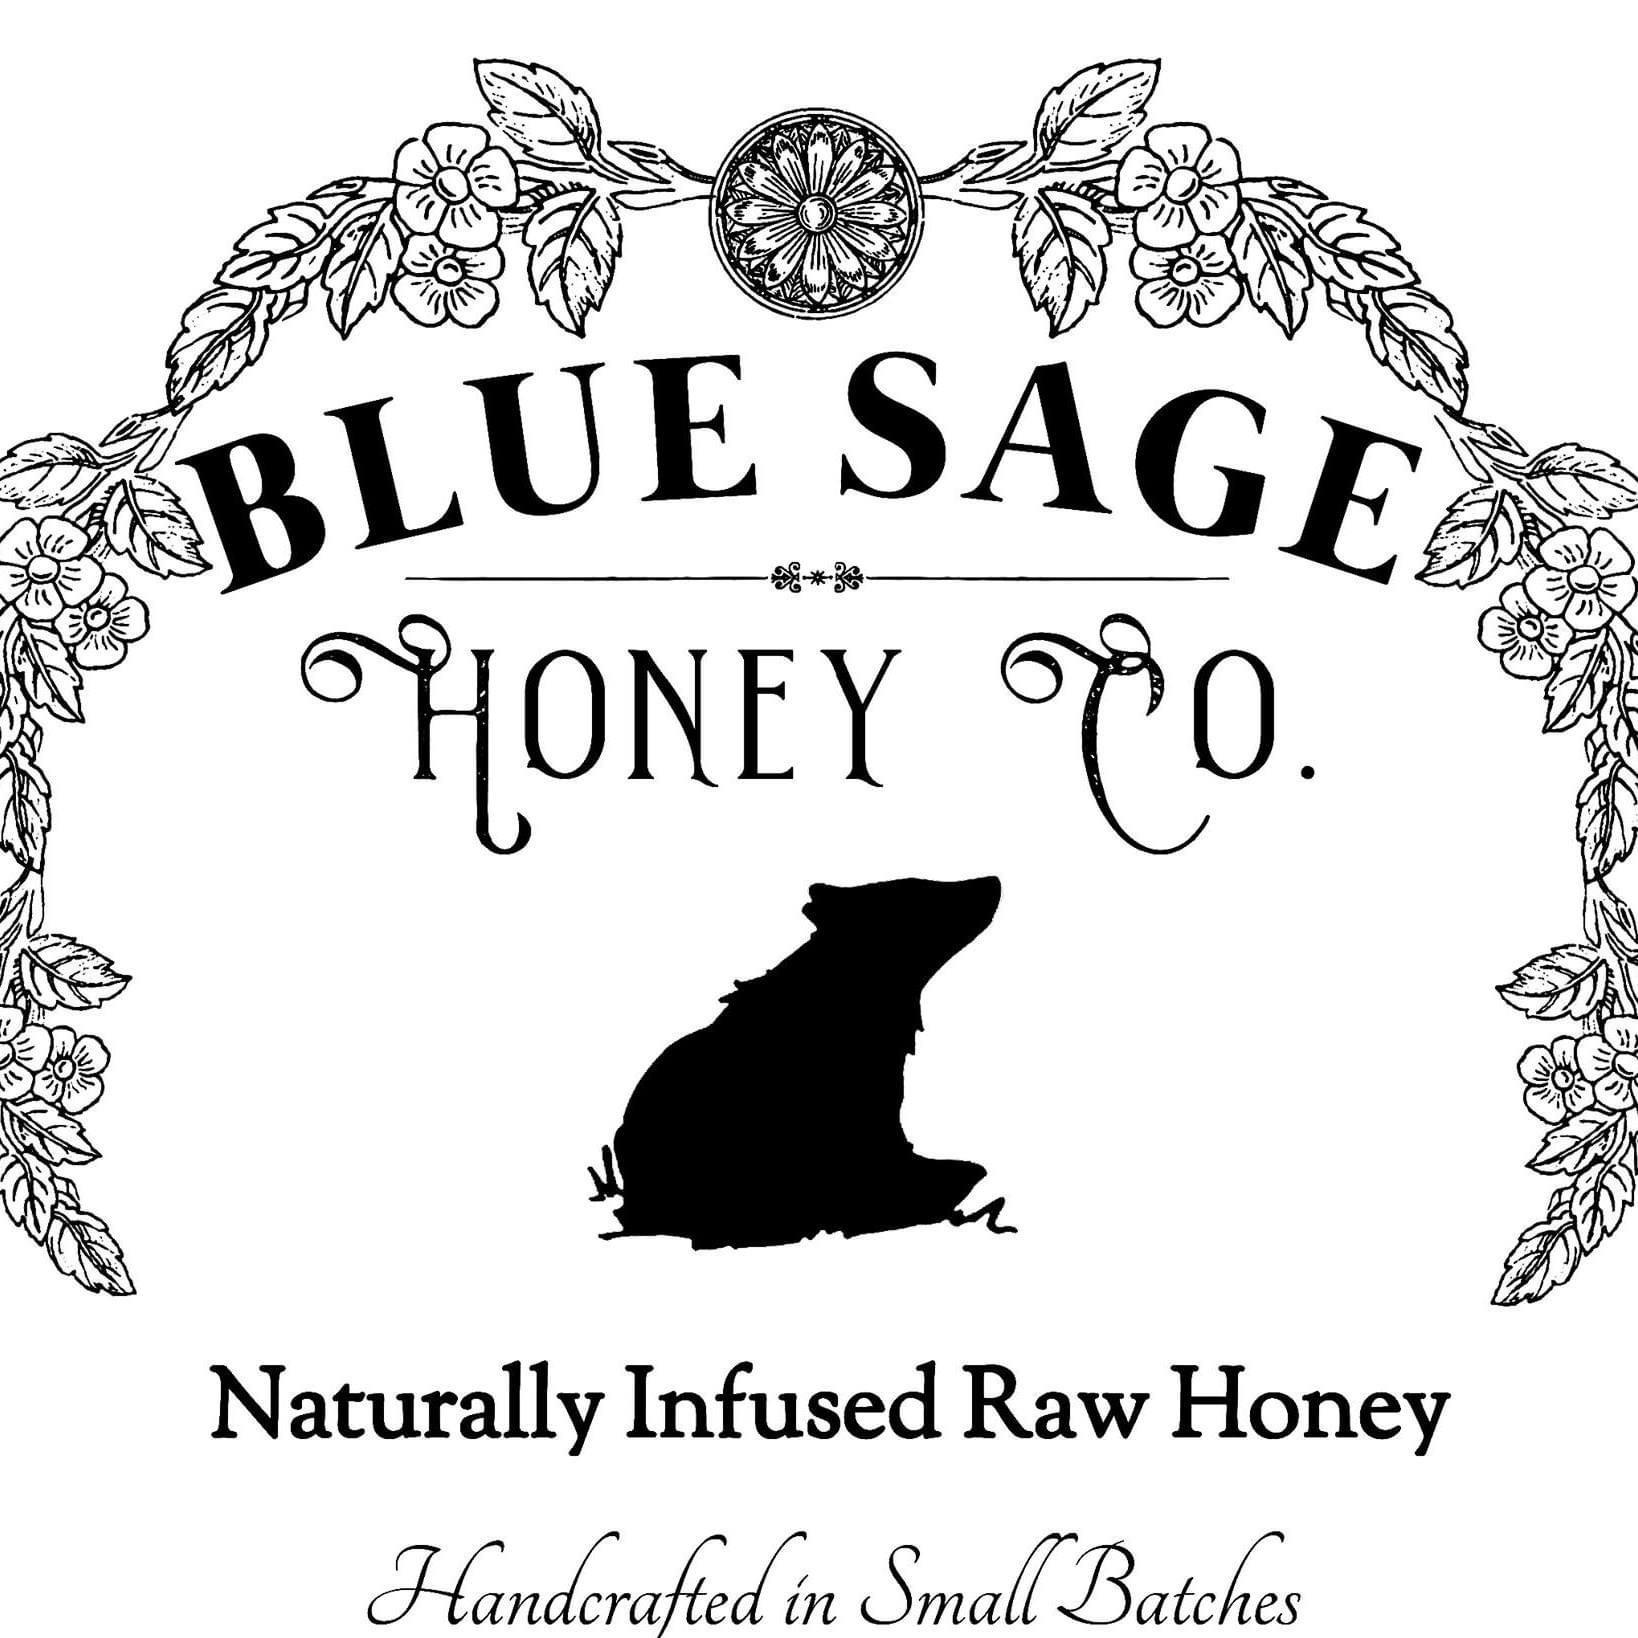 100% Virgin Clover Honey